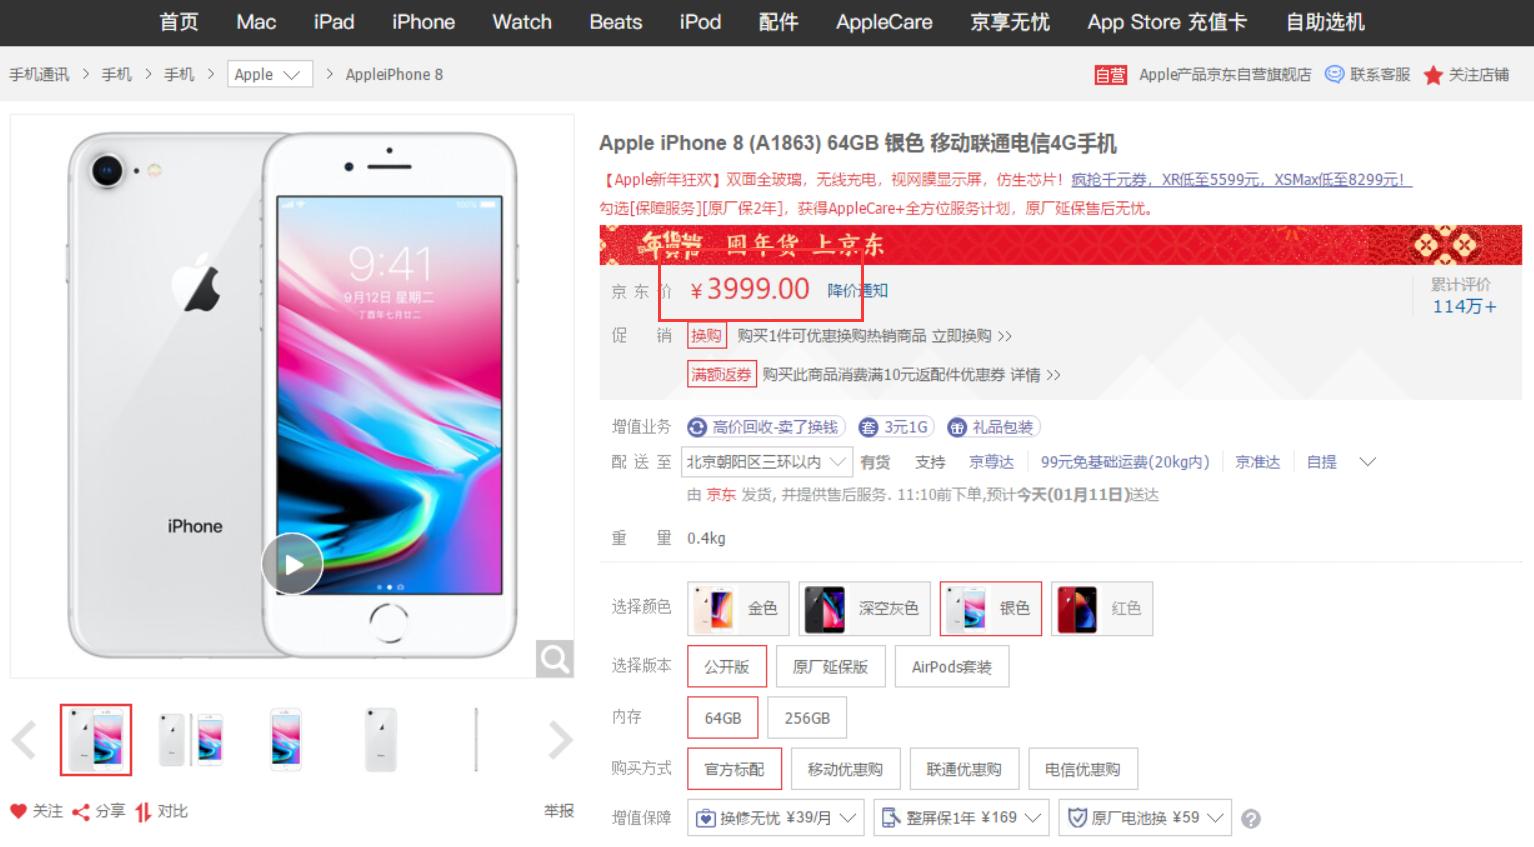 iPhone8系列大降价 最高直降1200元